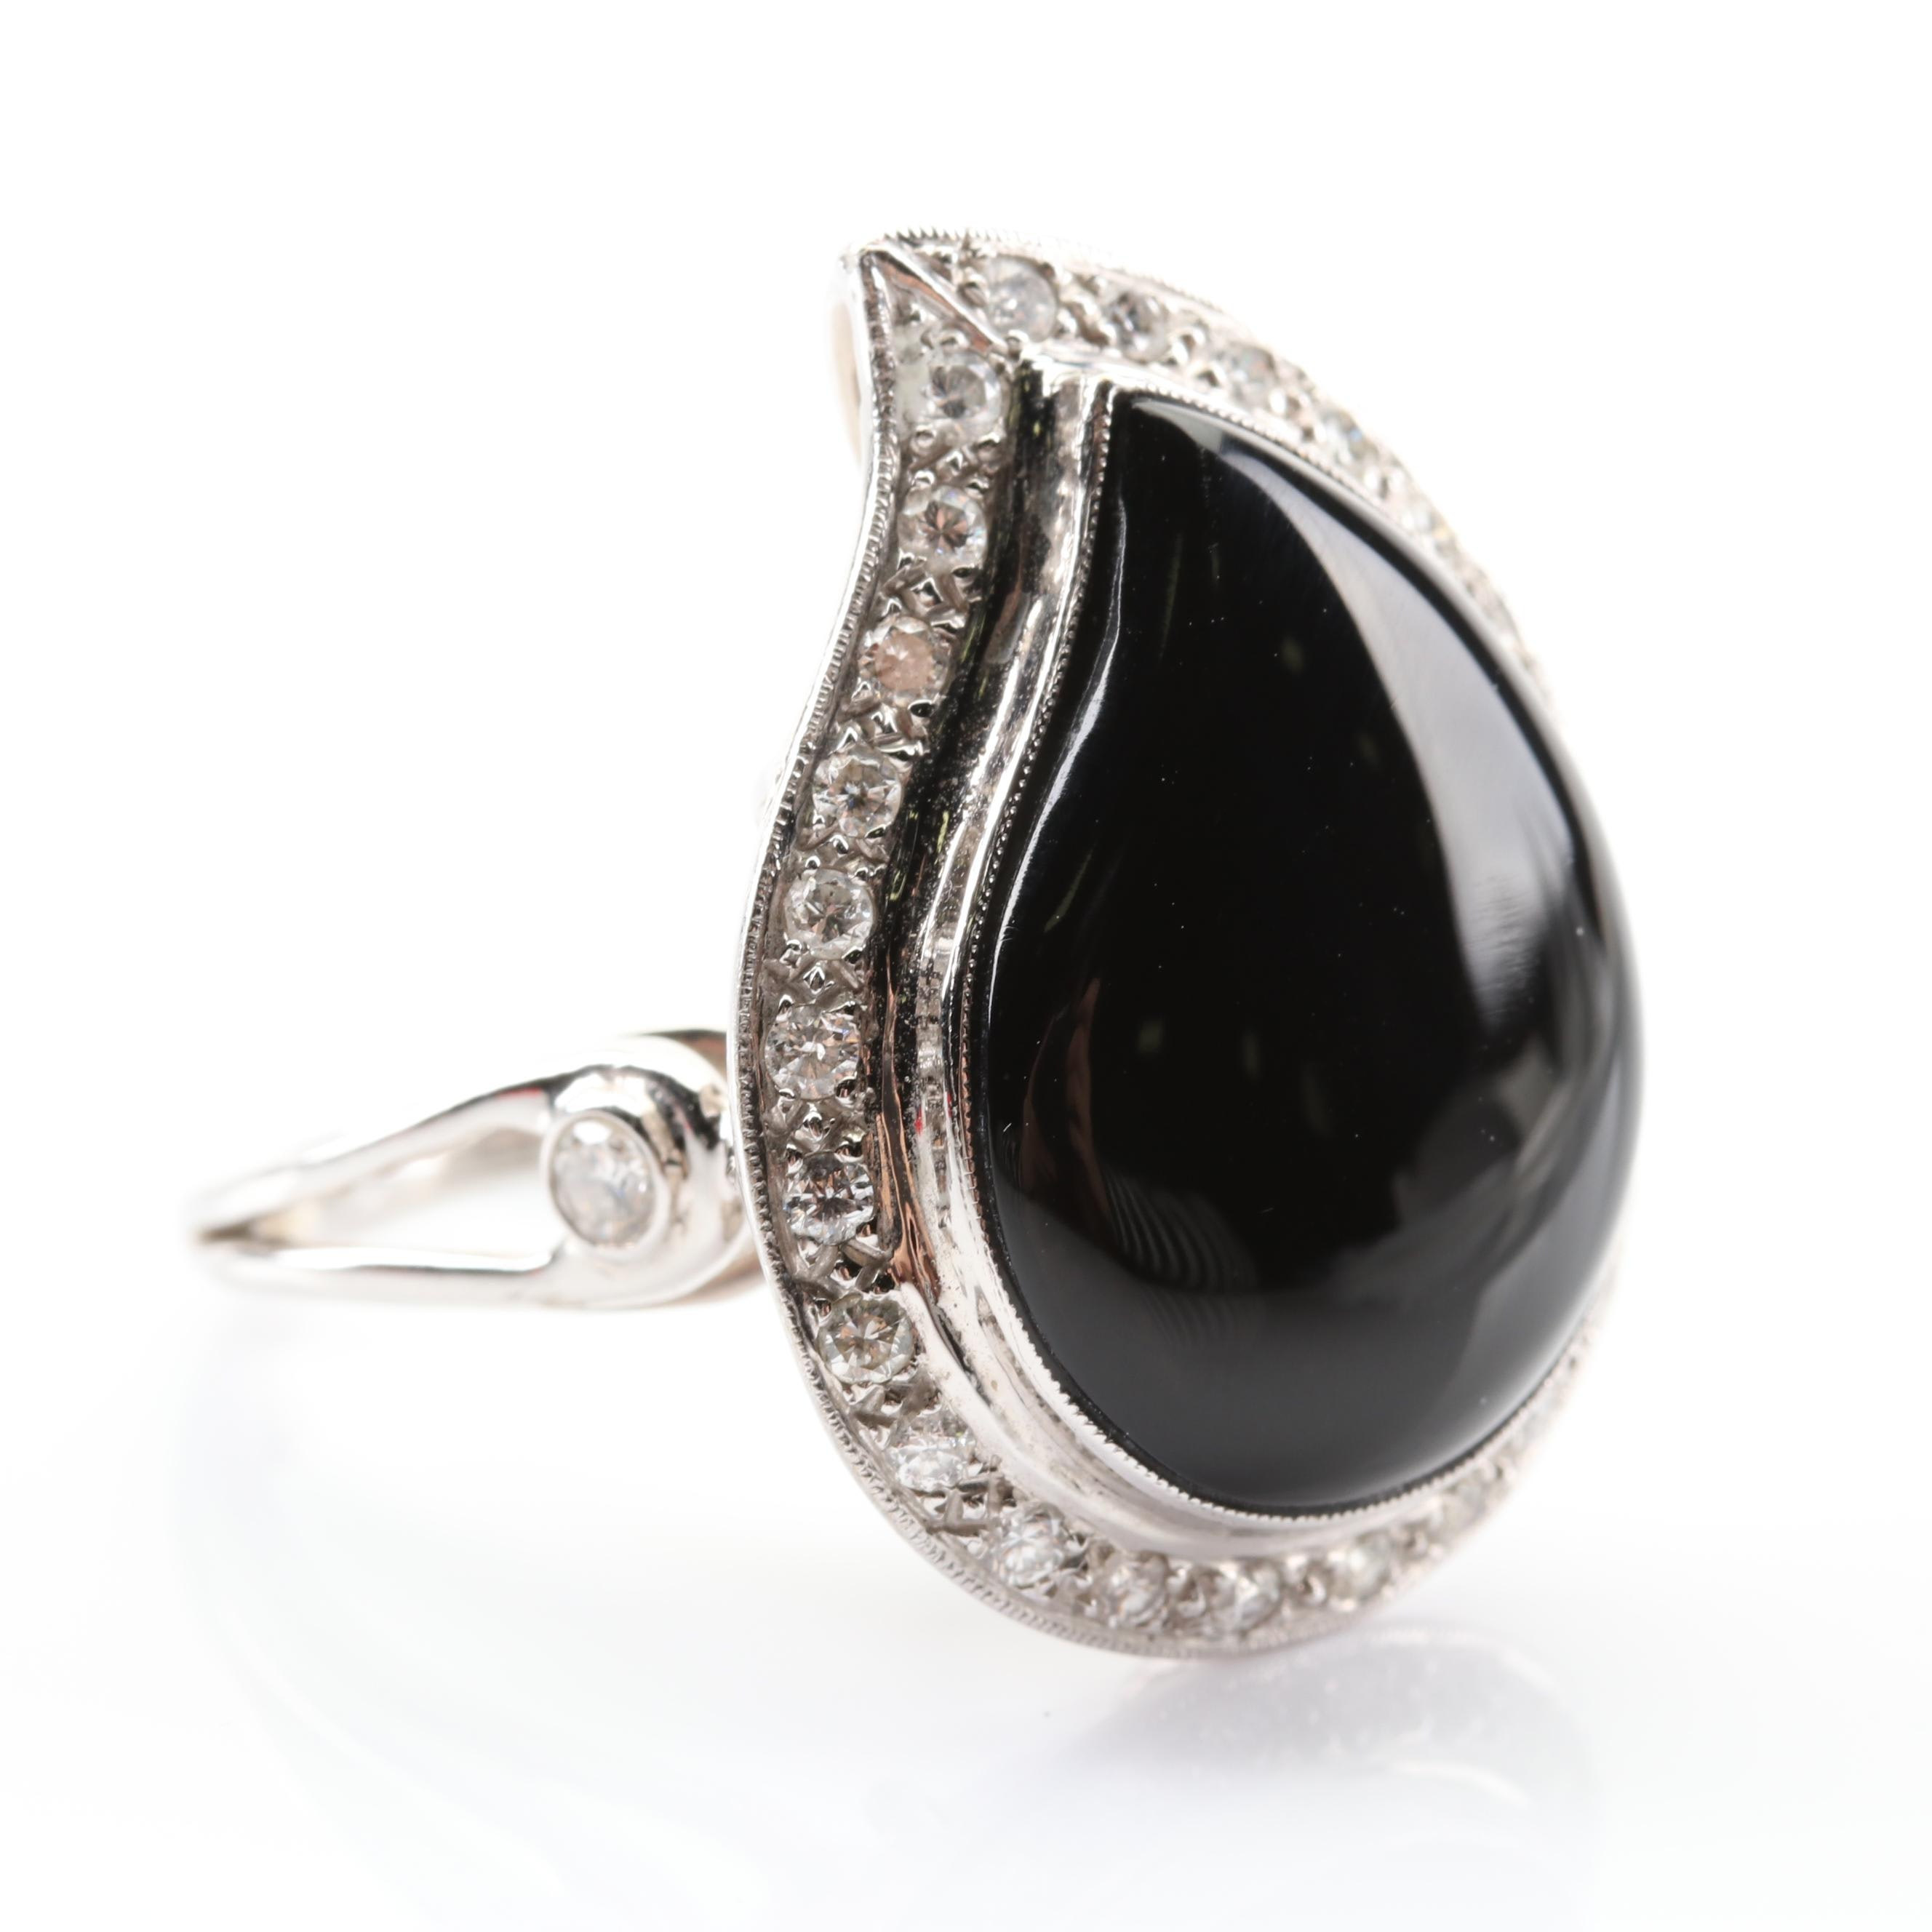 14K White Gold Black Onyx Ring with a Diamond Halo